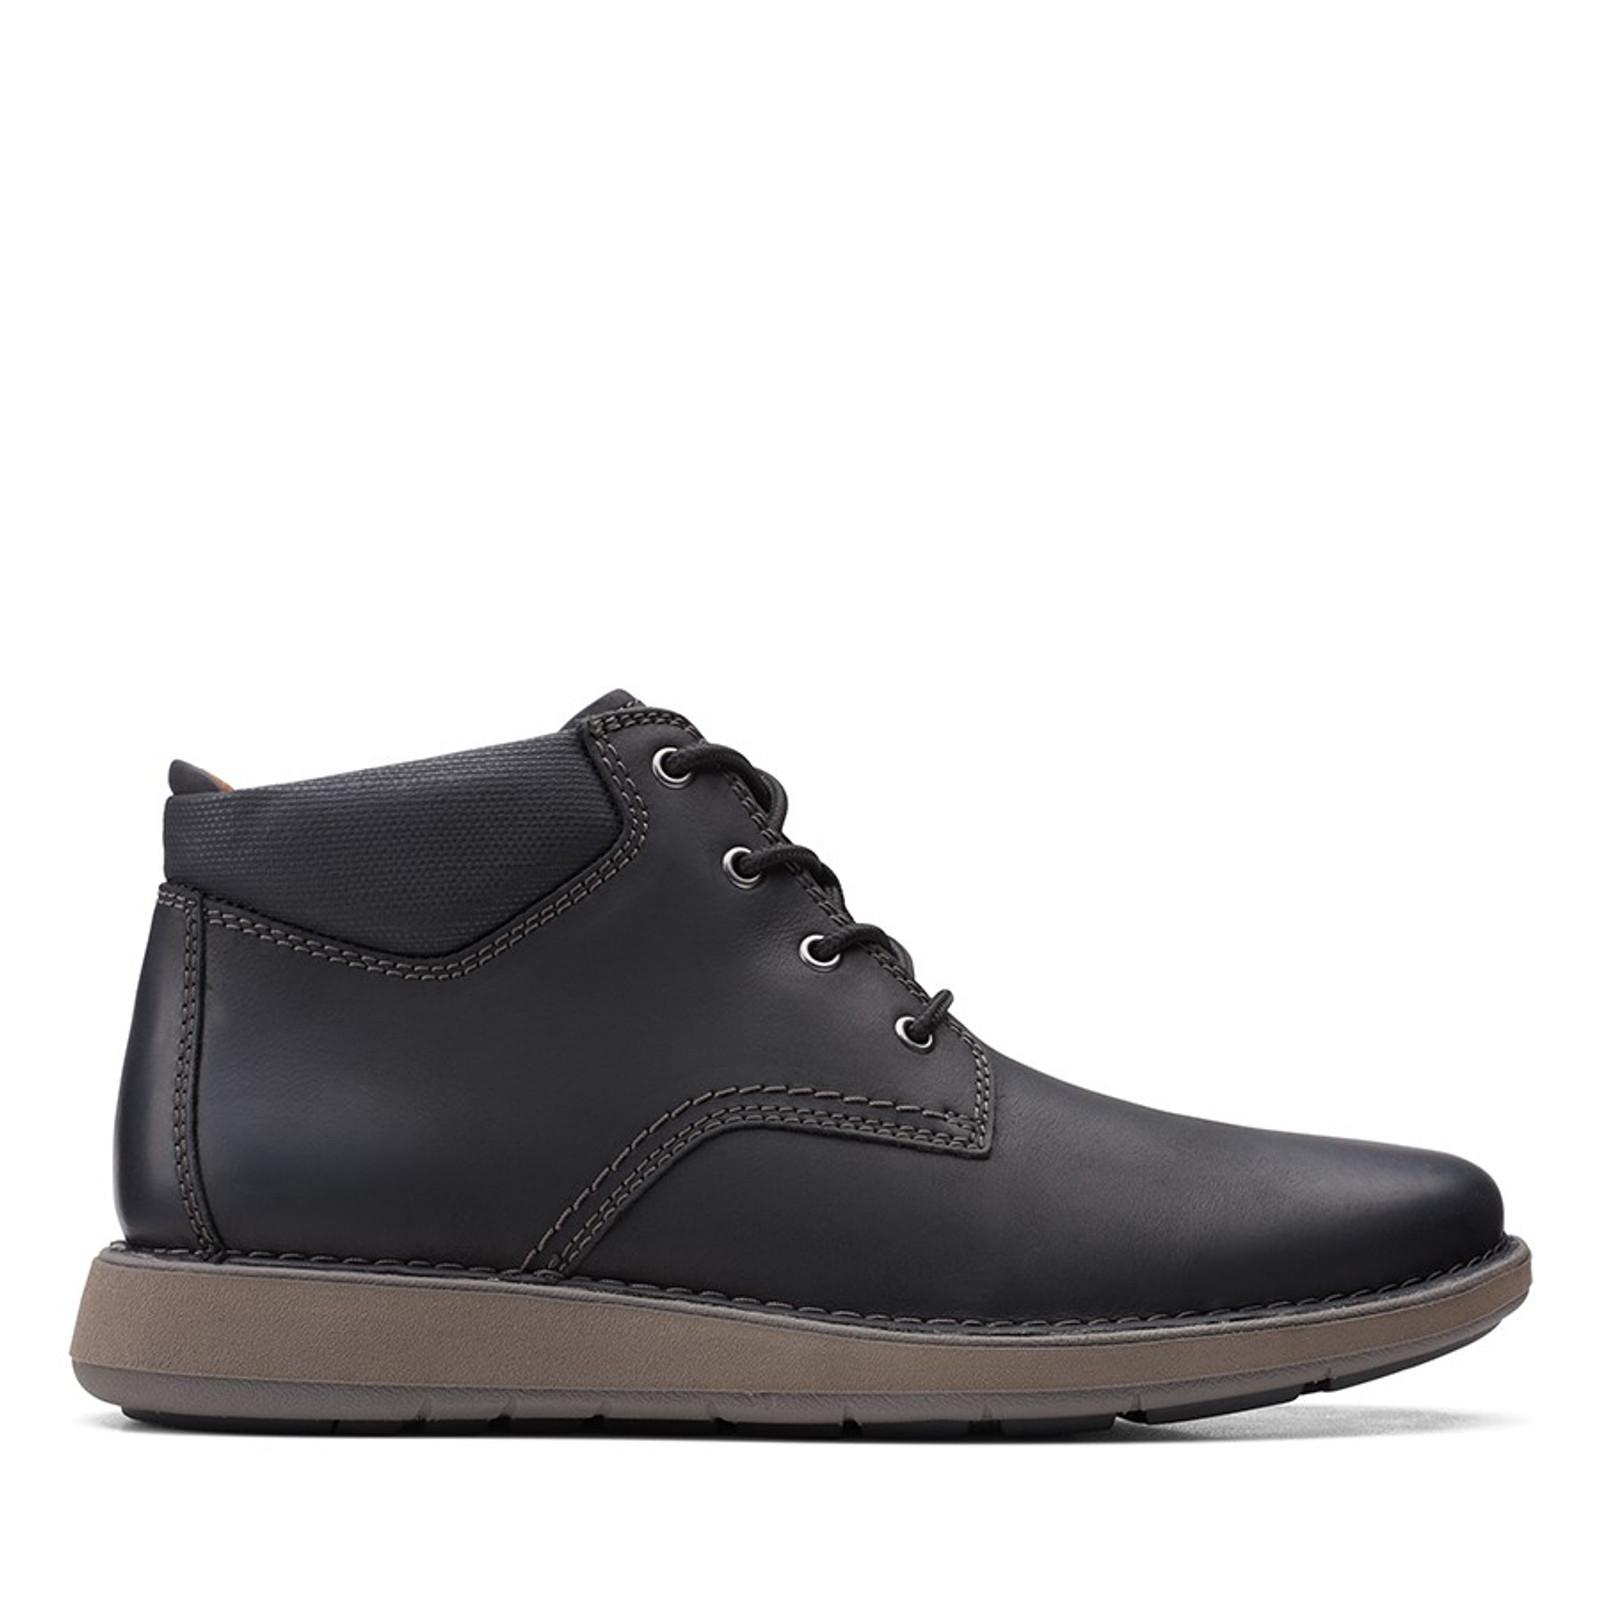 Clarks Mens UN LARVIK TOP2 Black Oily Leather